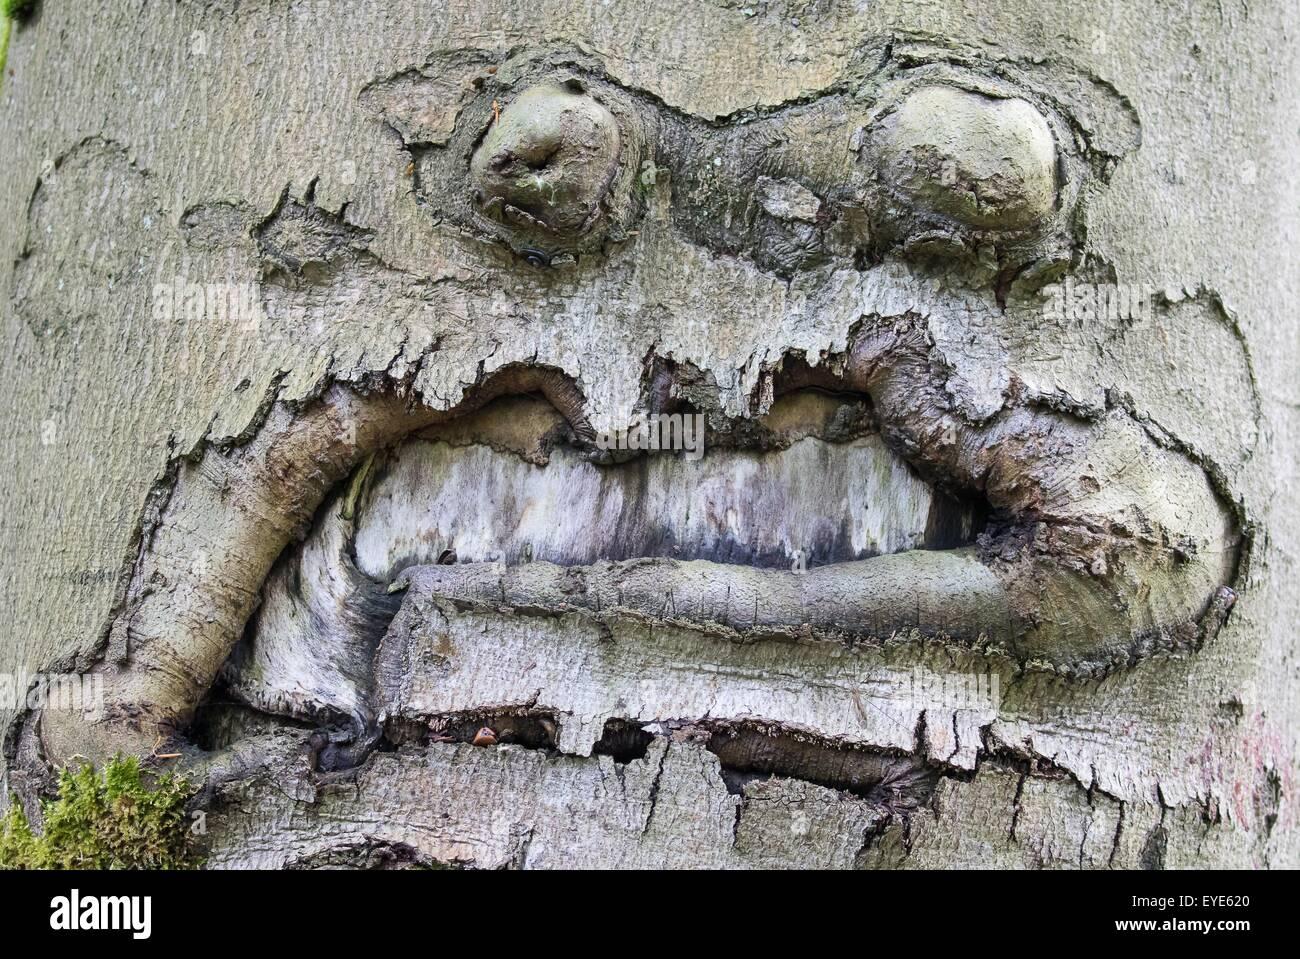 Como mueca connation sobre un tronco de haya (Fagus sp.), Hesse, Alemania Imagen De Stock